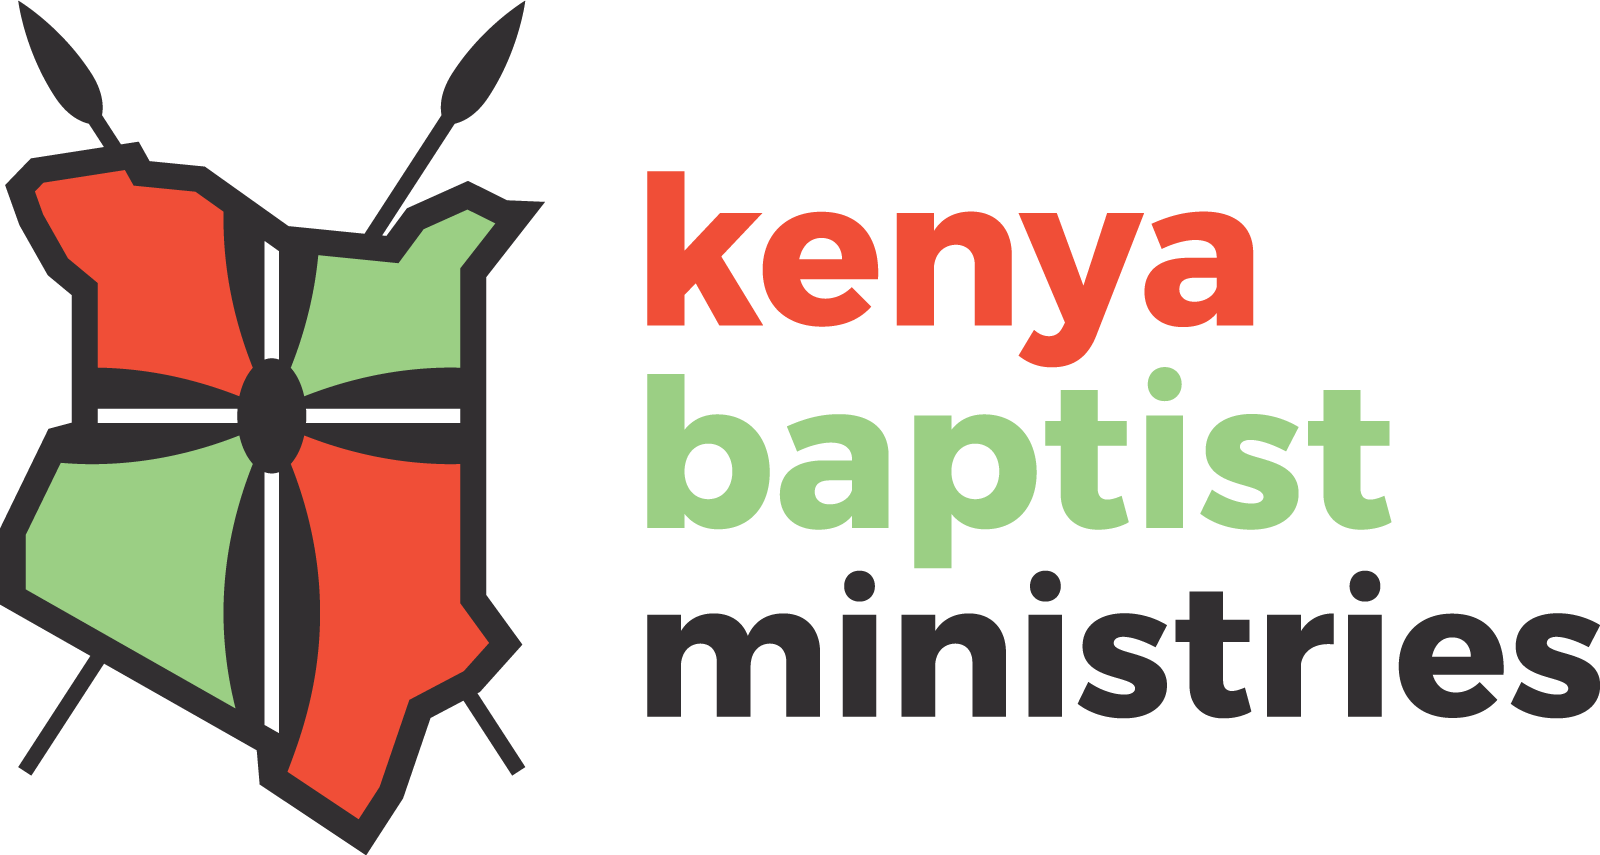 Kenya Baptist Ministries | kbmGO.org